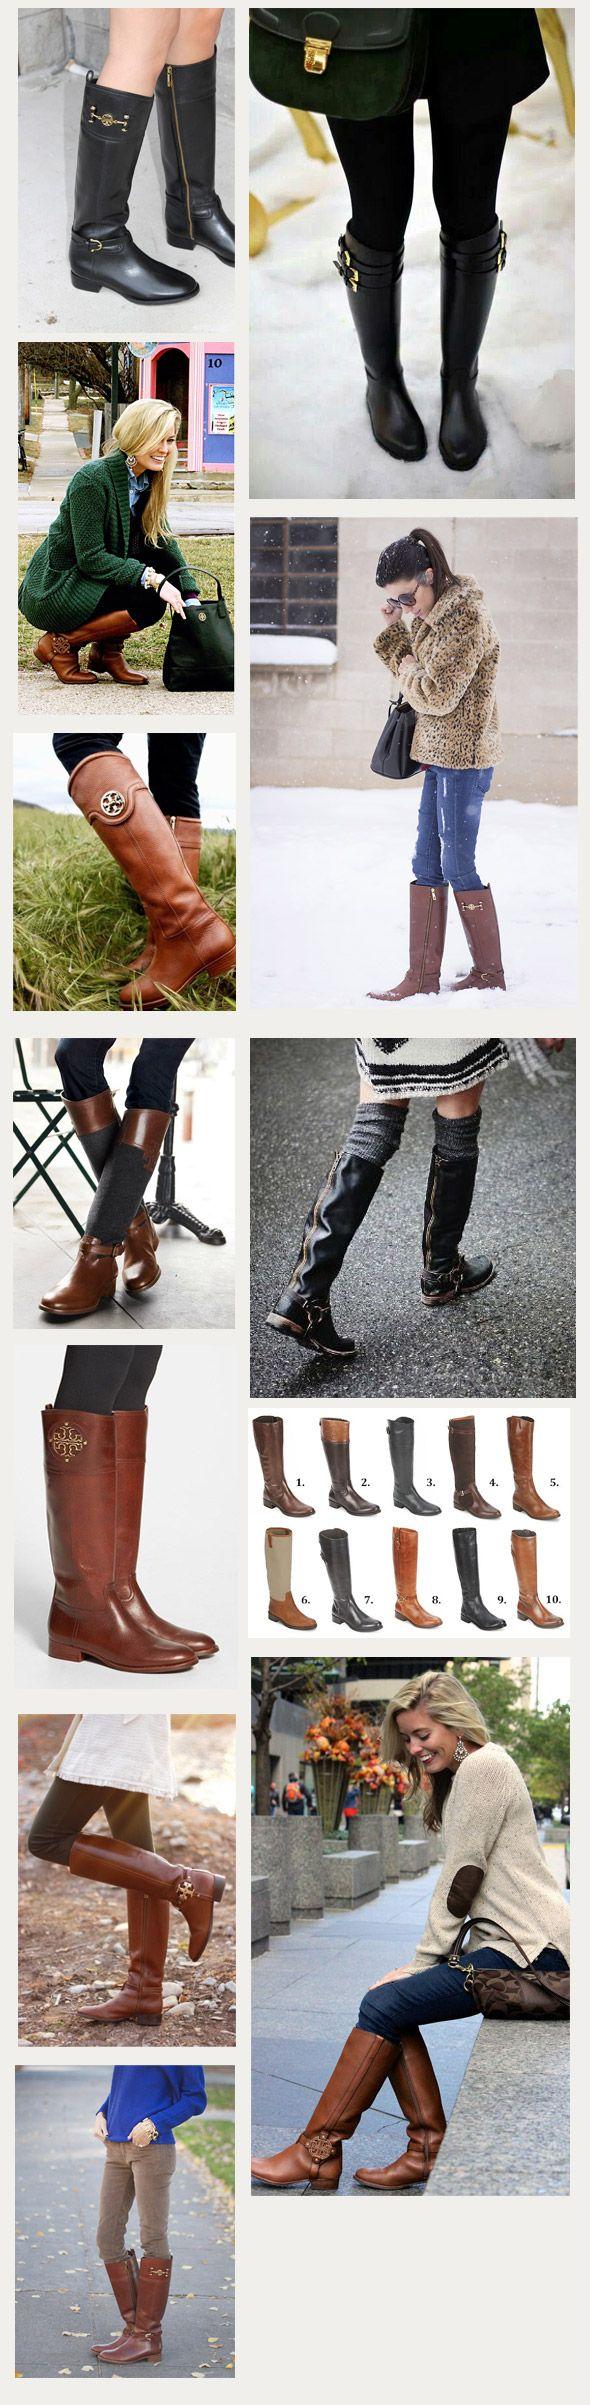 Tendencia: Botas Tory Burch - Tiendas Dressup Providencia http://tiendasdu.cl/blog-ropa-mujer-femenina-moda/tendencia-botas-tory-burch.html